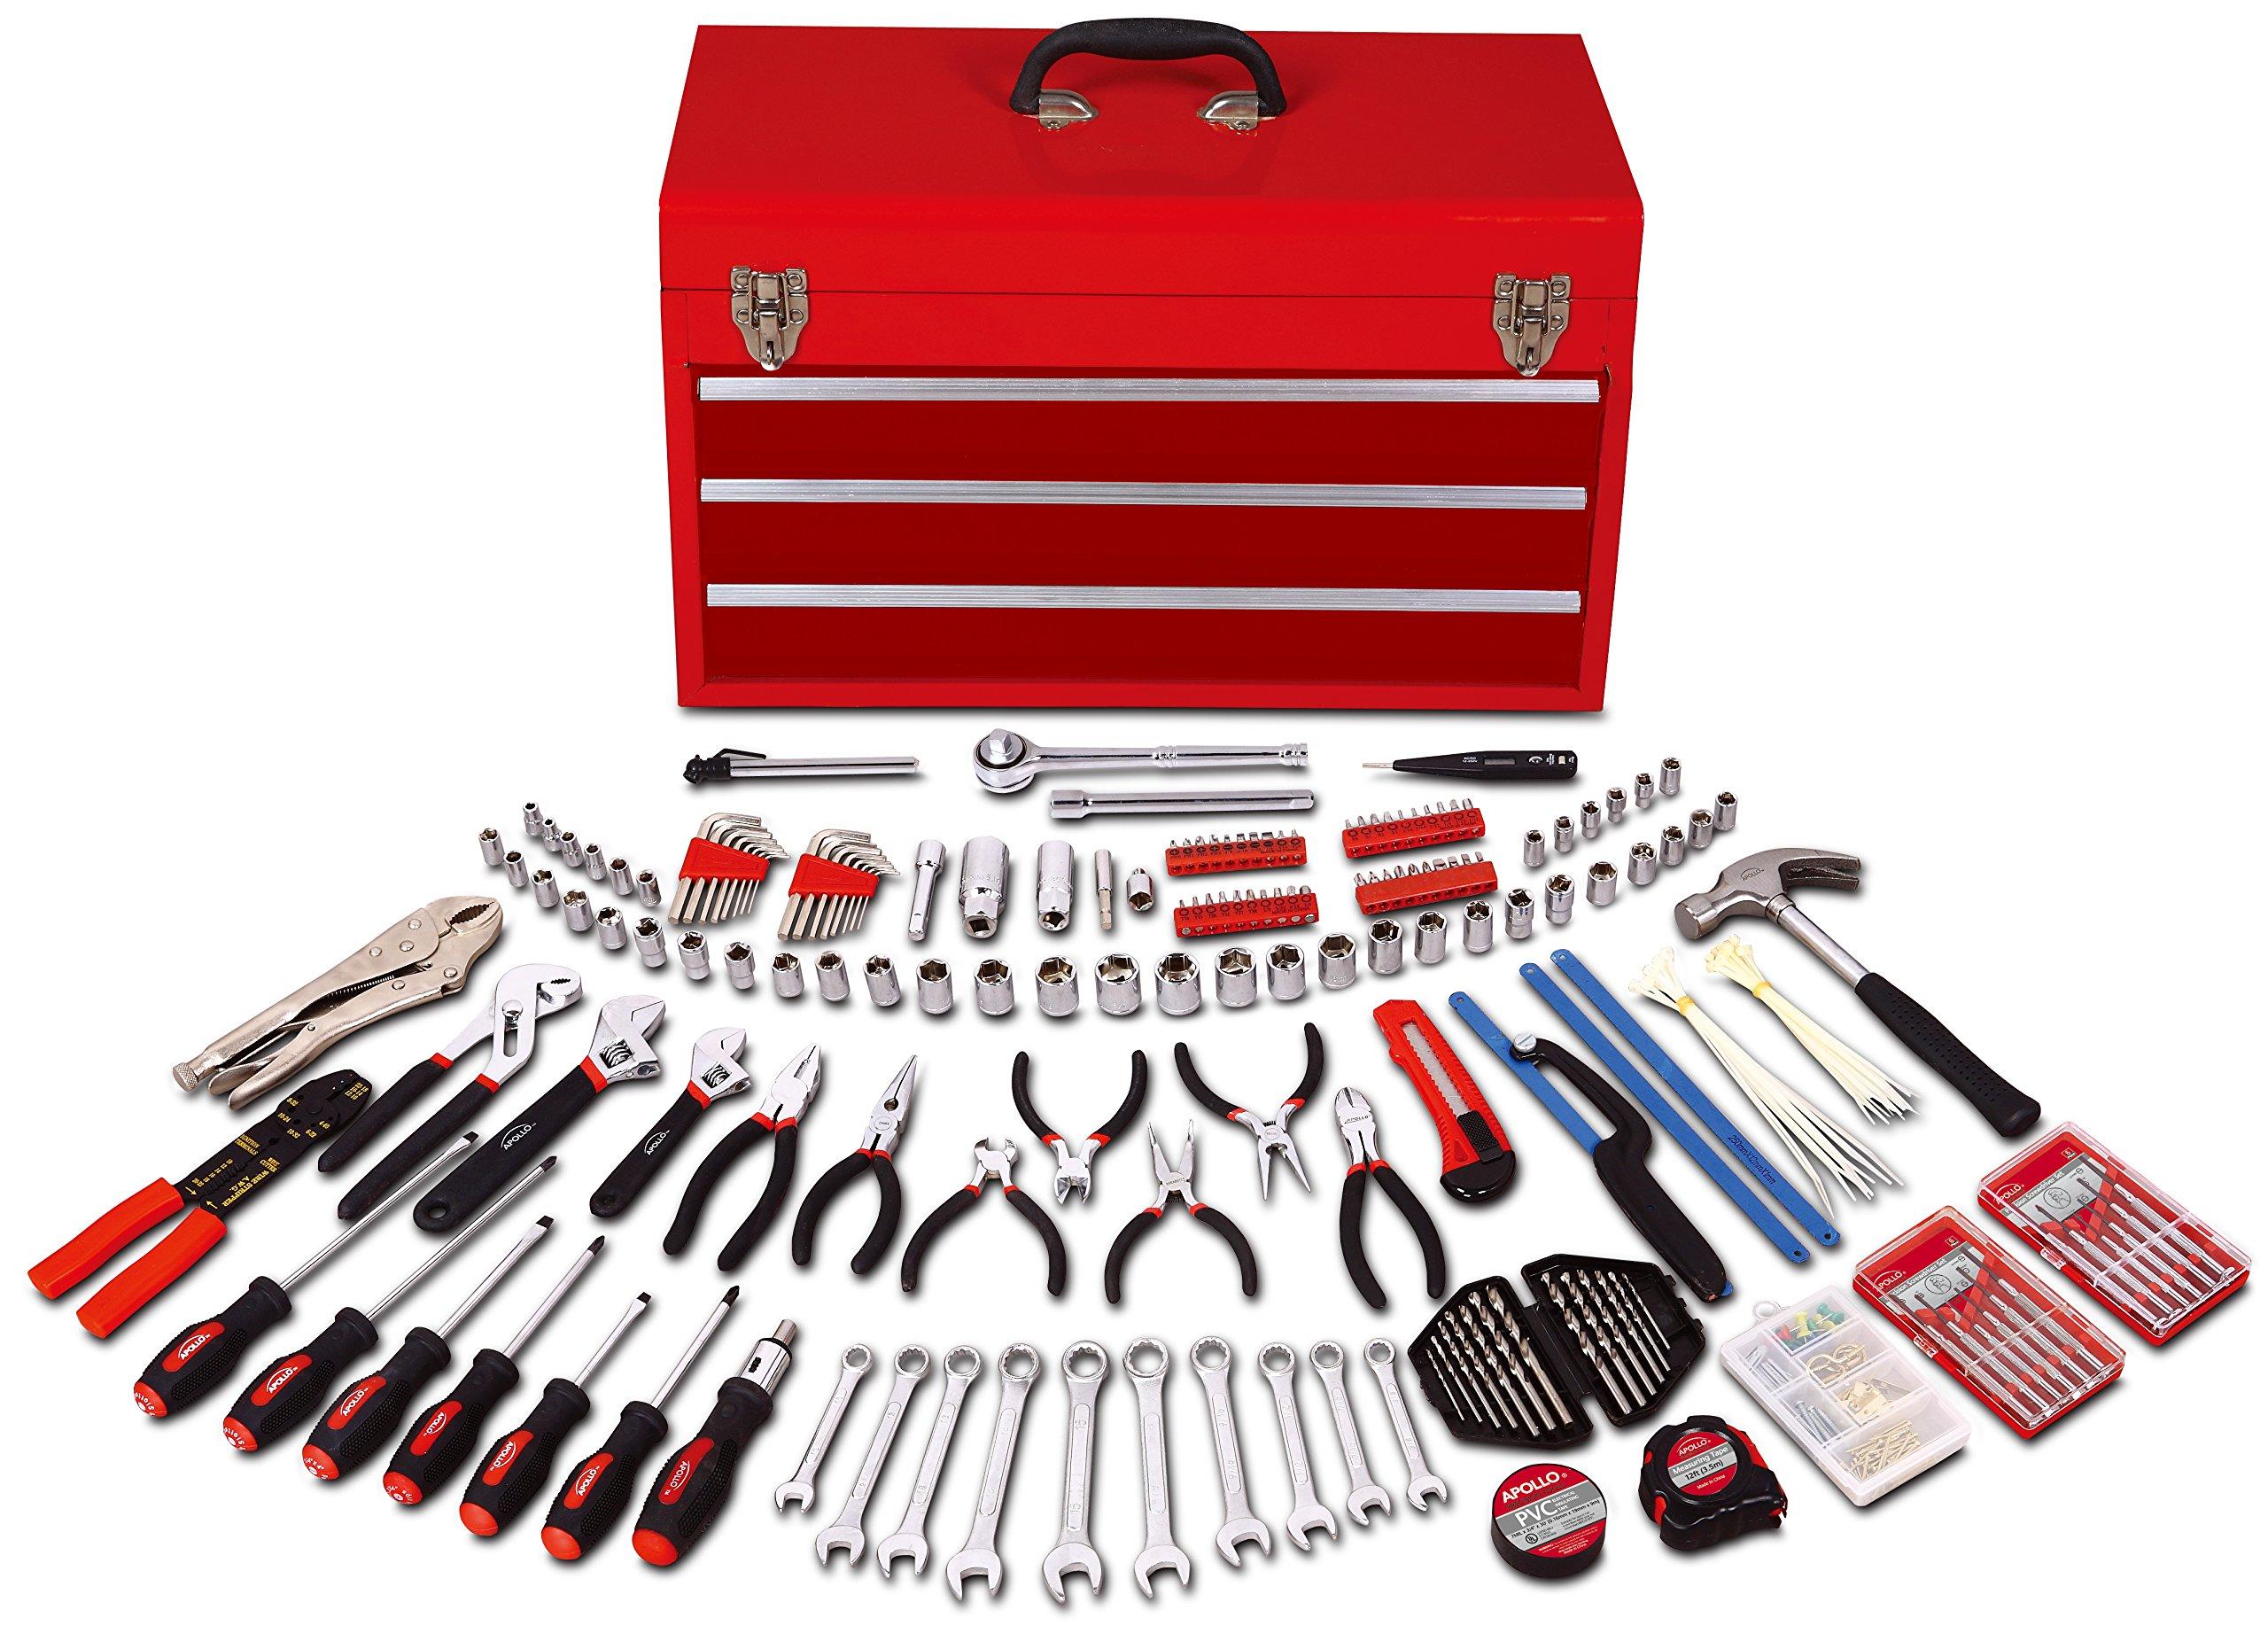 Apollo Tools DT6803 297 Piece Mechanics Tool Kit in Three Drawer Steel Tool Box